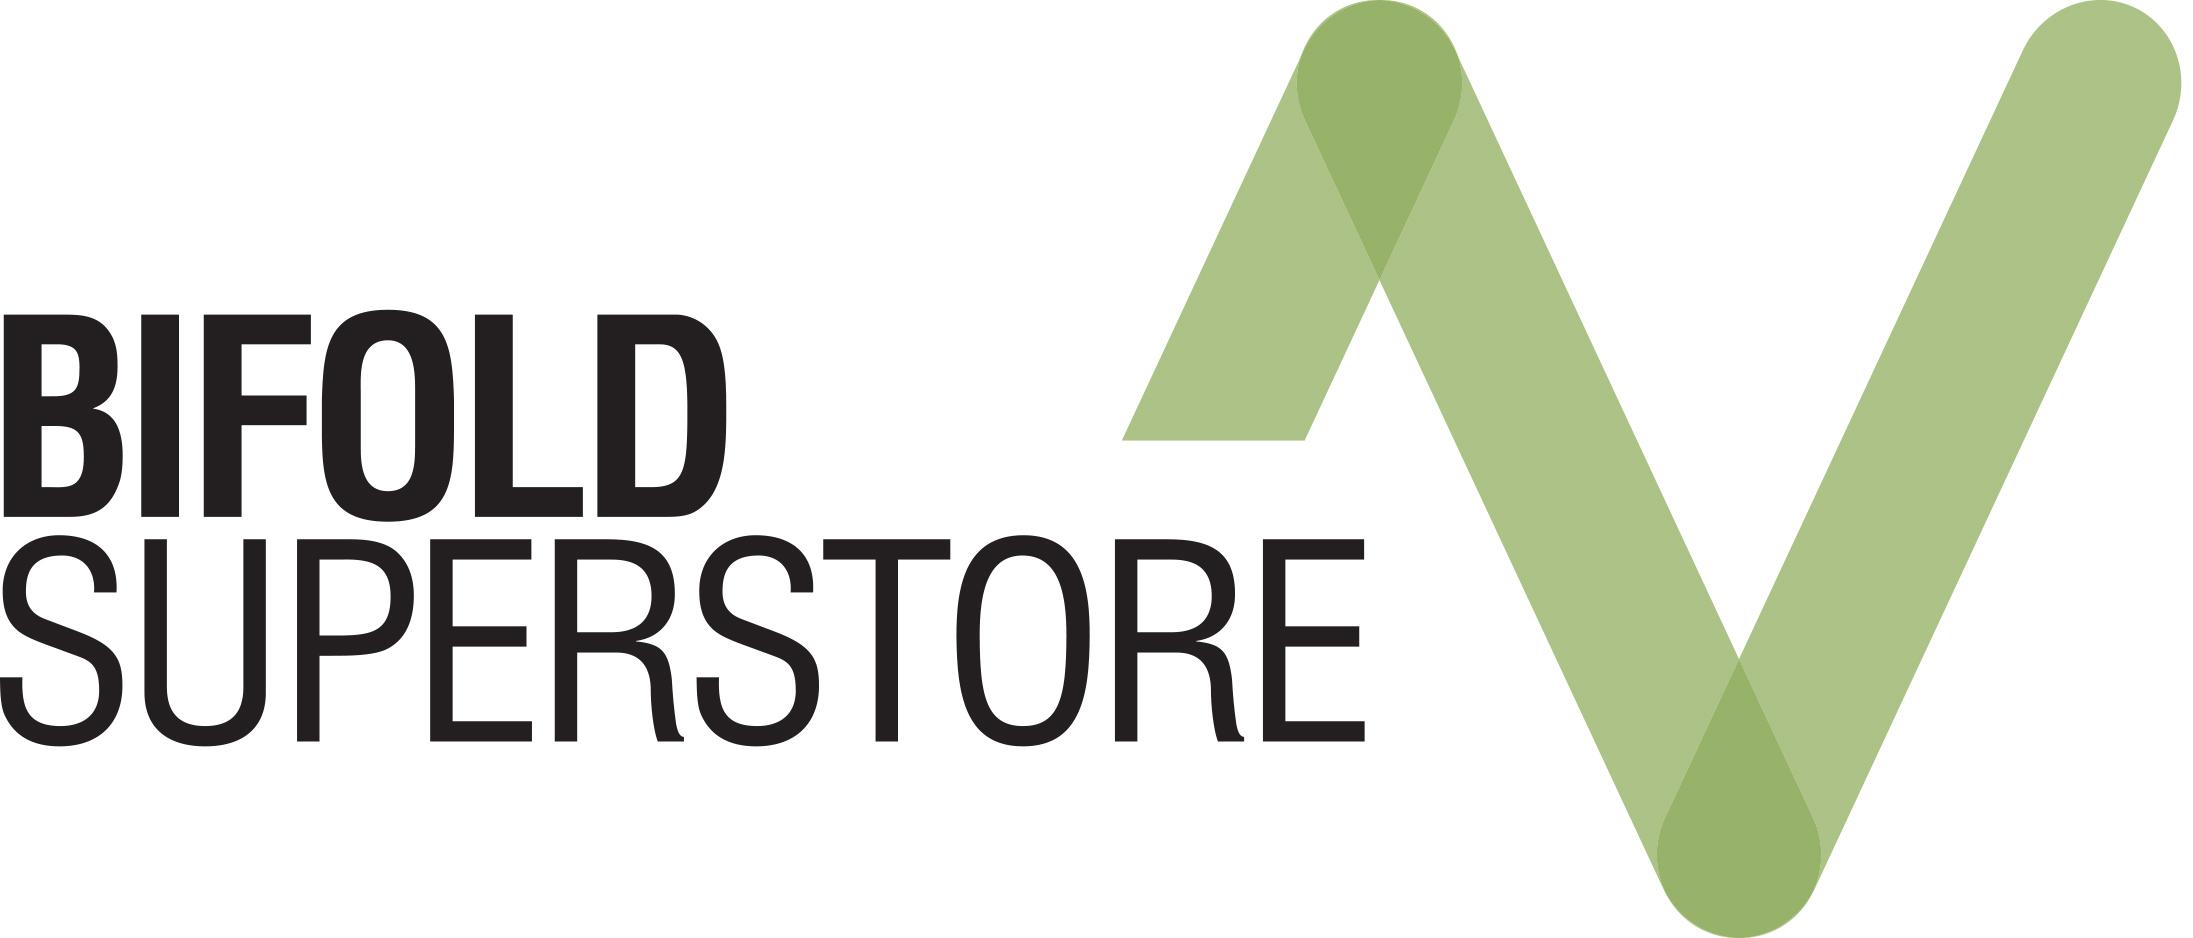 bifold-superstore-300dpi-logo